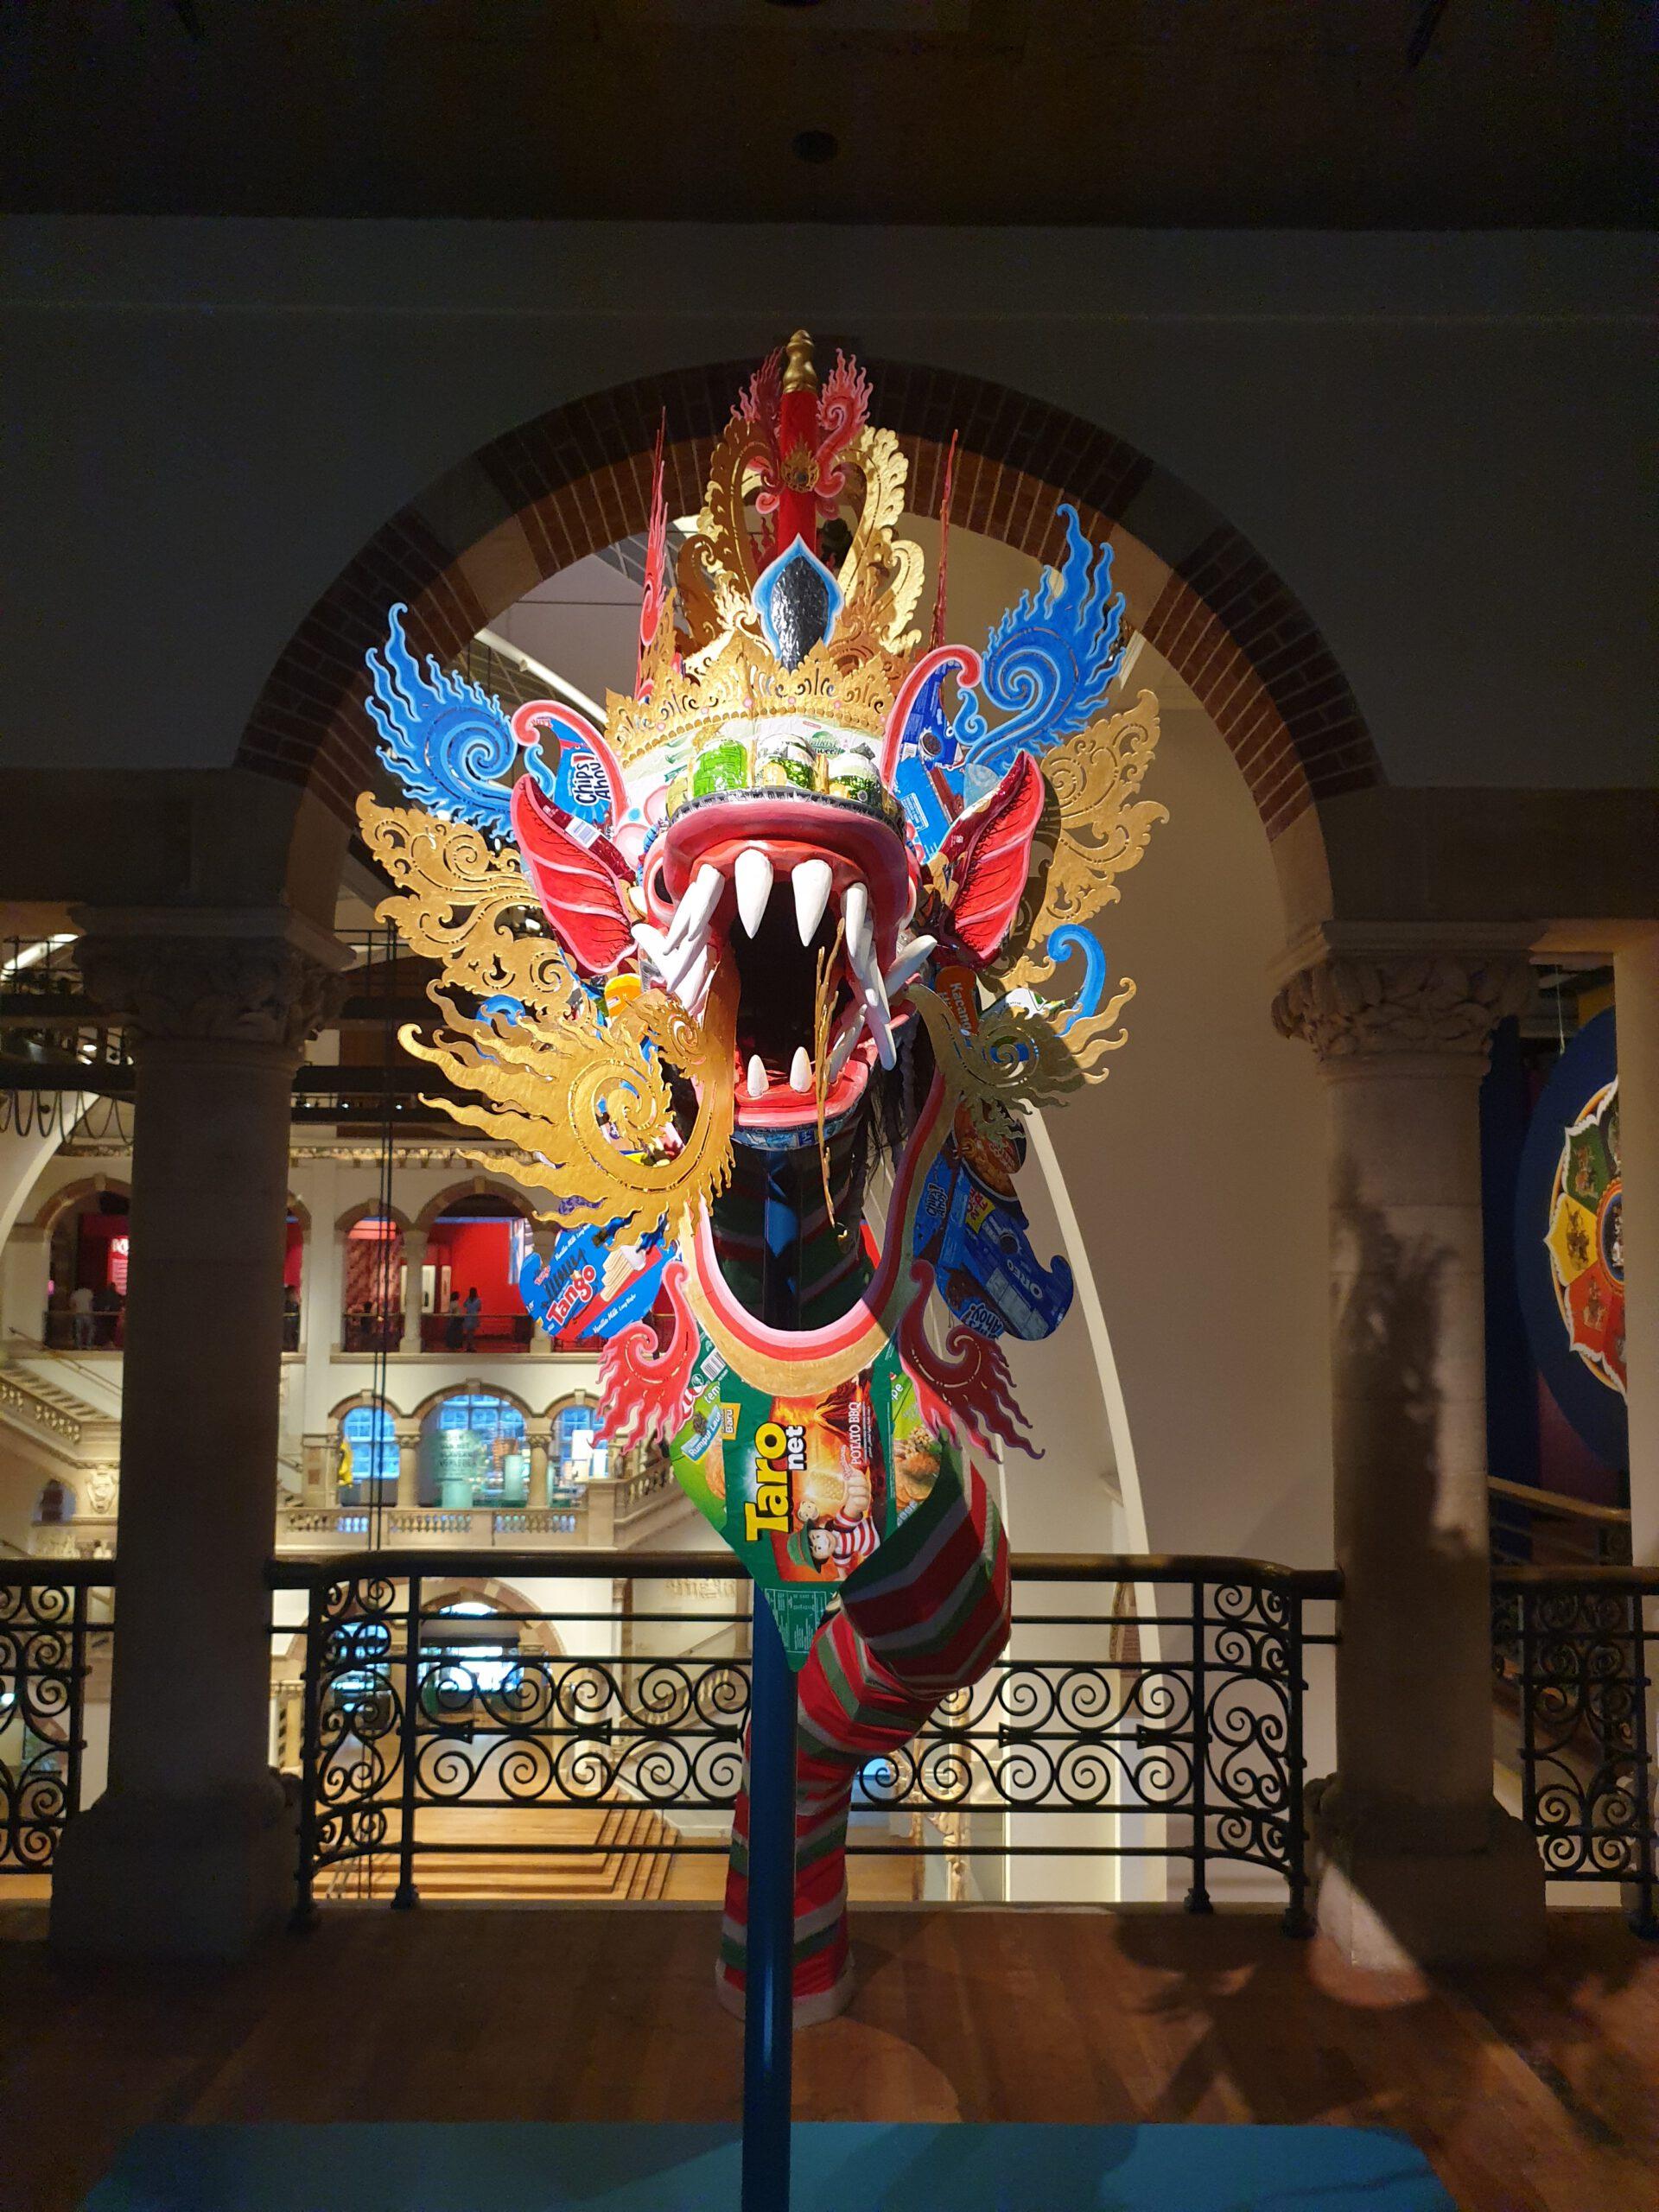 Staycation Amsterdam - Reisgelukjes - Bali Behind the Scenes Rainbow Dragon Made Bayak